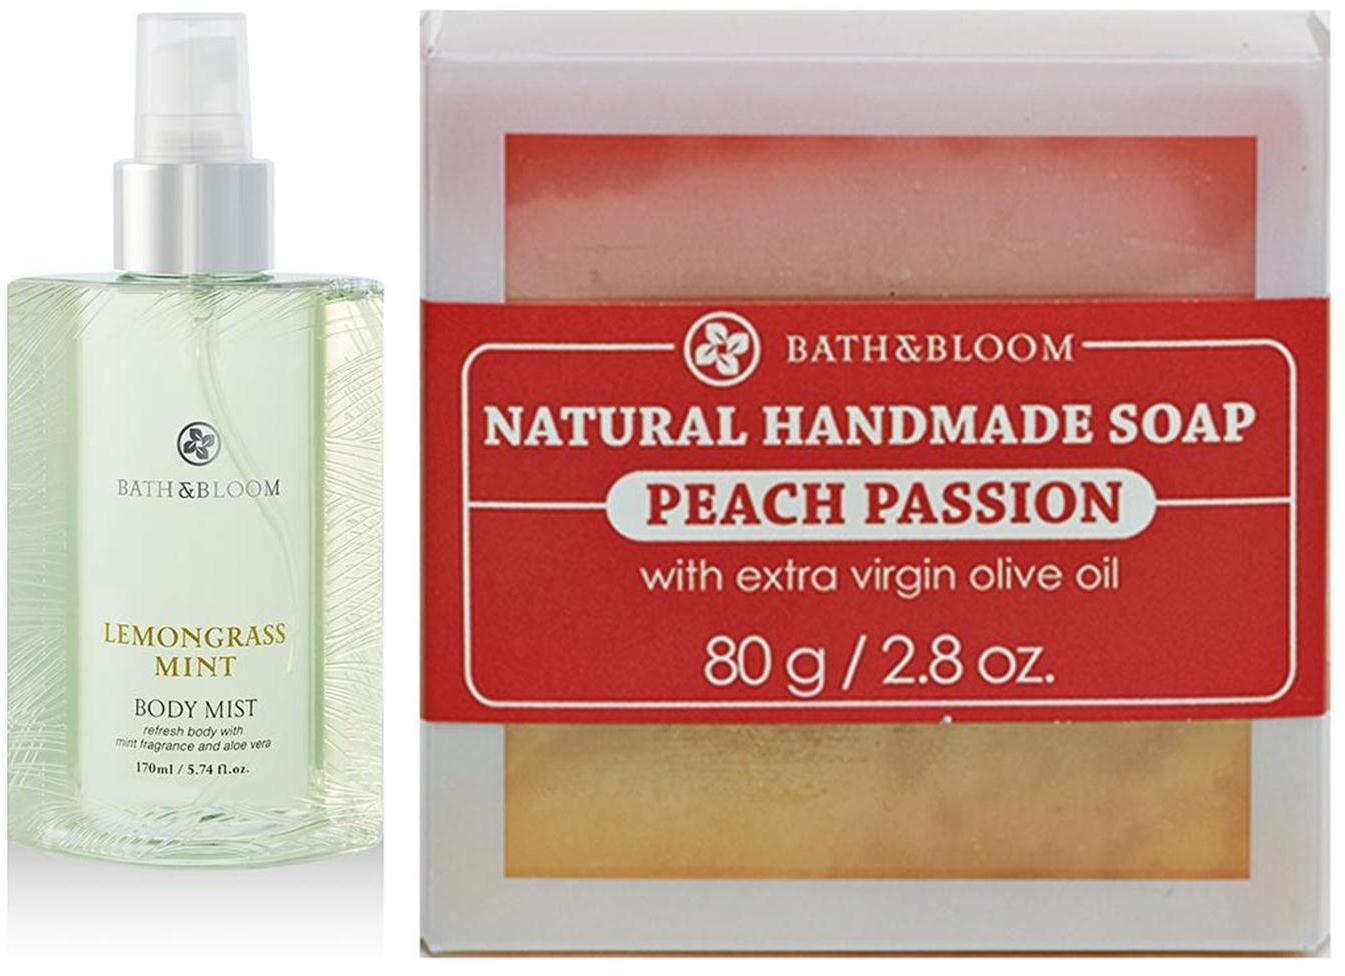 NEW!! BATH & BLOOM PEACH PASSION SOAP SET A45 BATH & BLOOM LEMONGRASS MINT BODY WATSONS DHL EXPRES